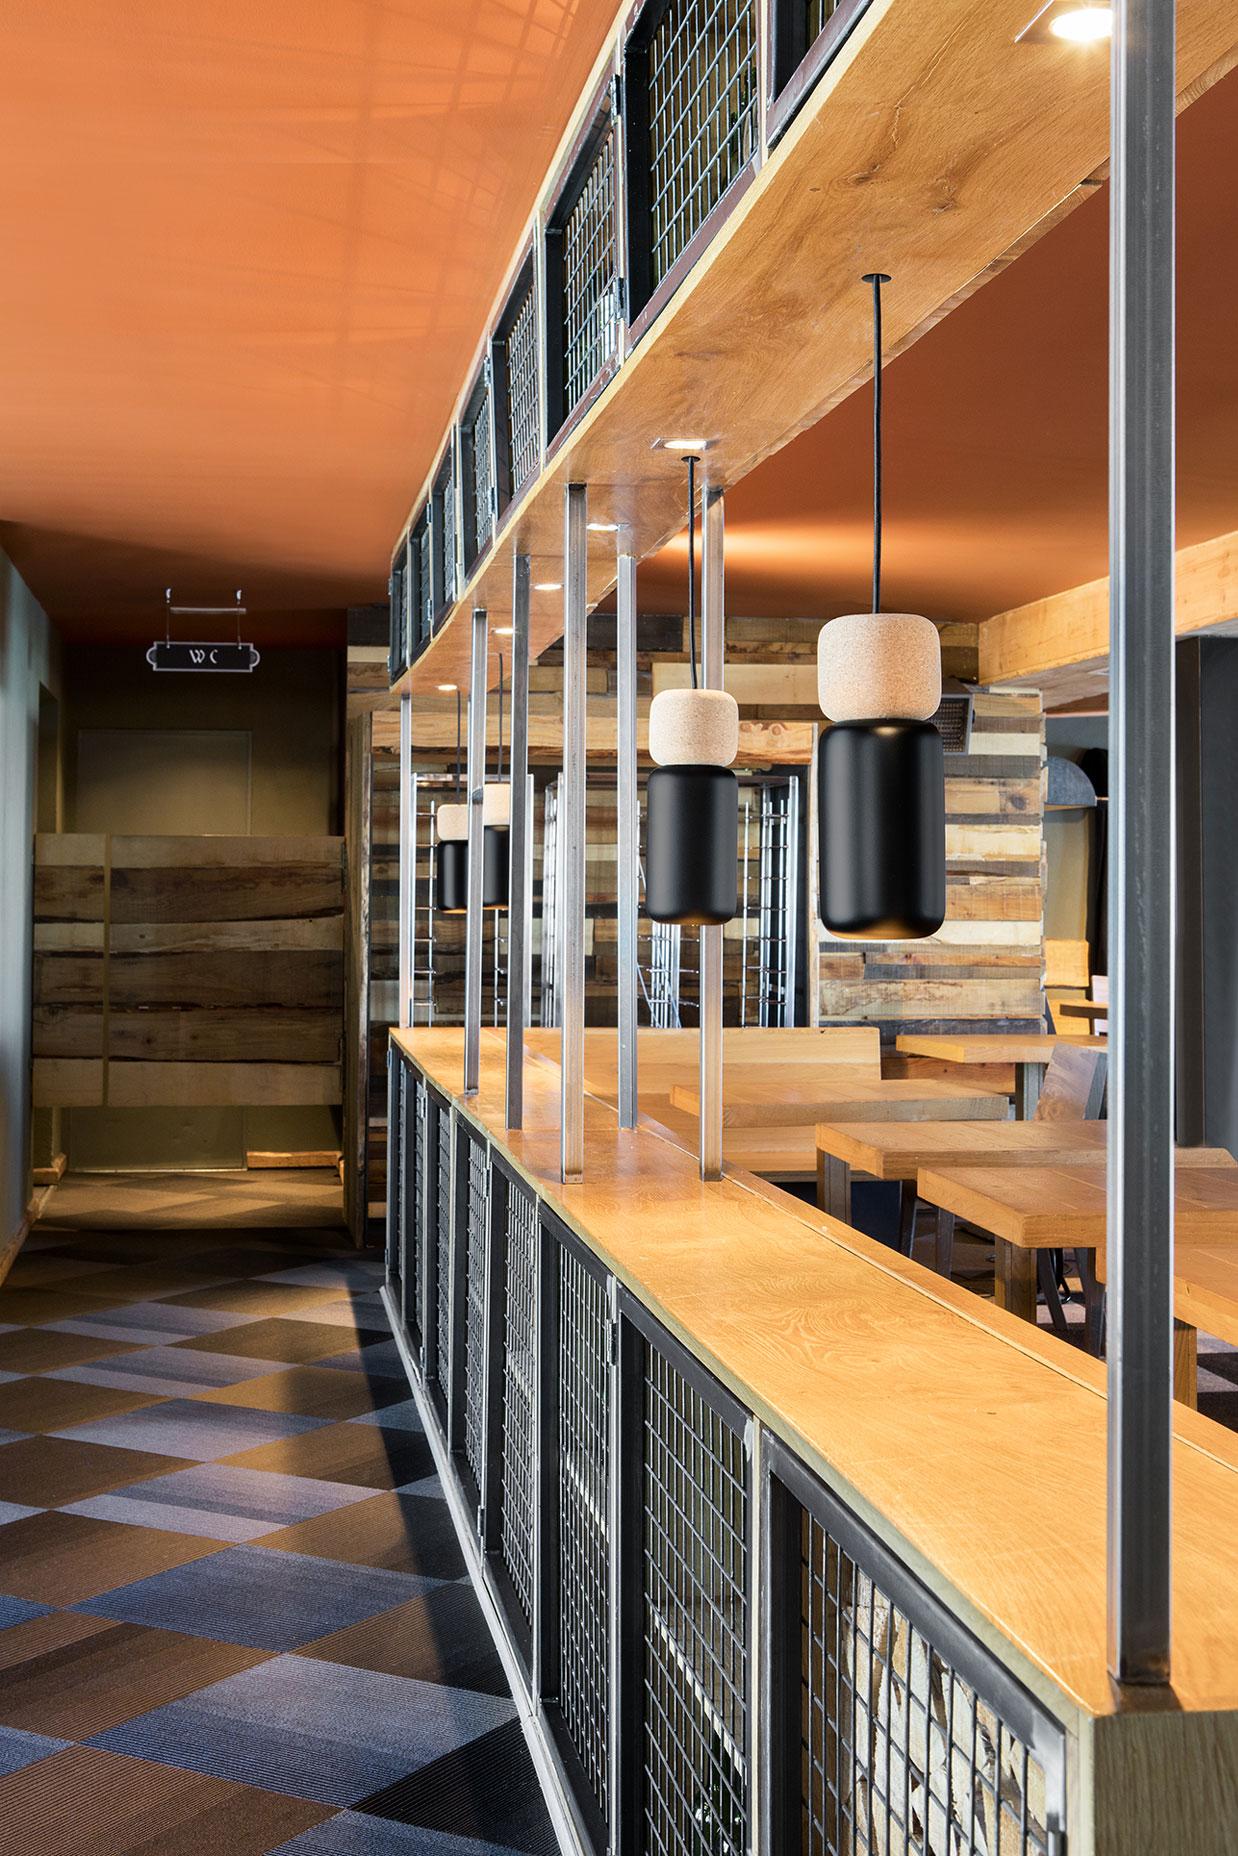 Detalle Barra La Cabana restaurante Granvalira, Andorra - Rosa Colet